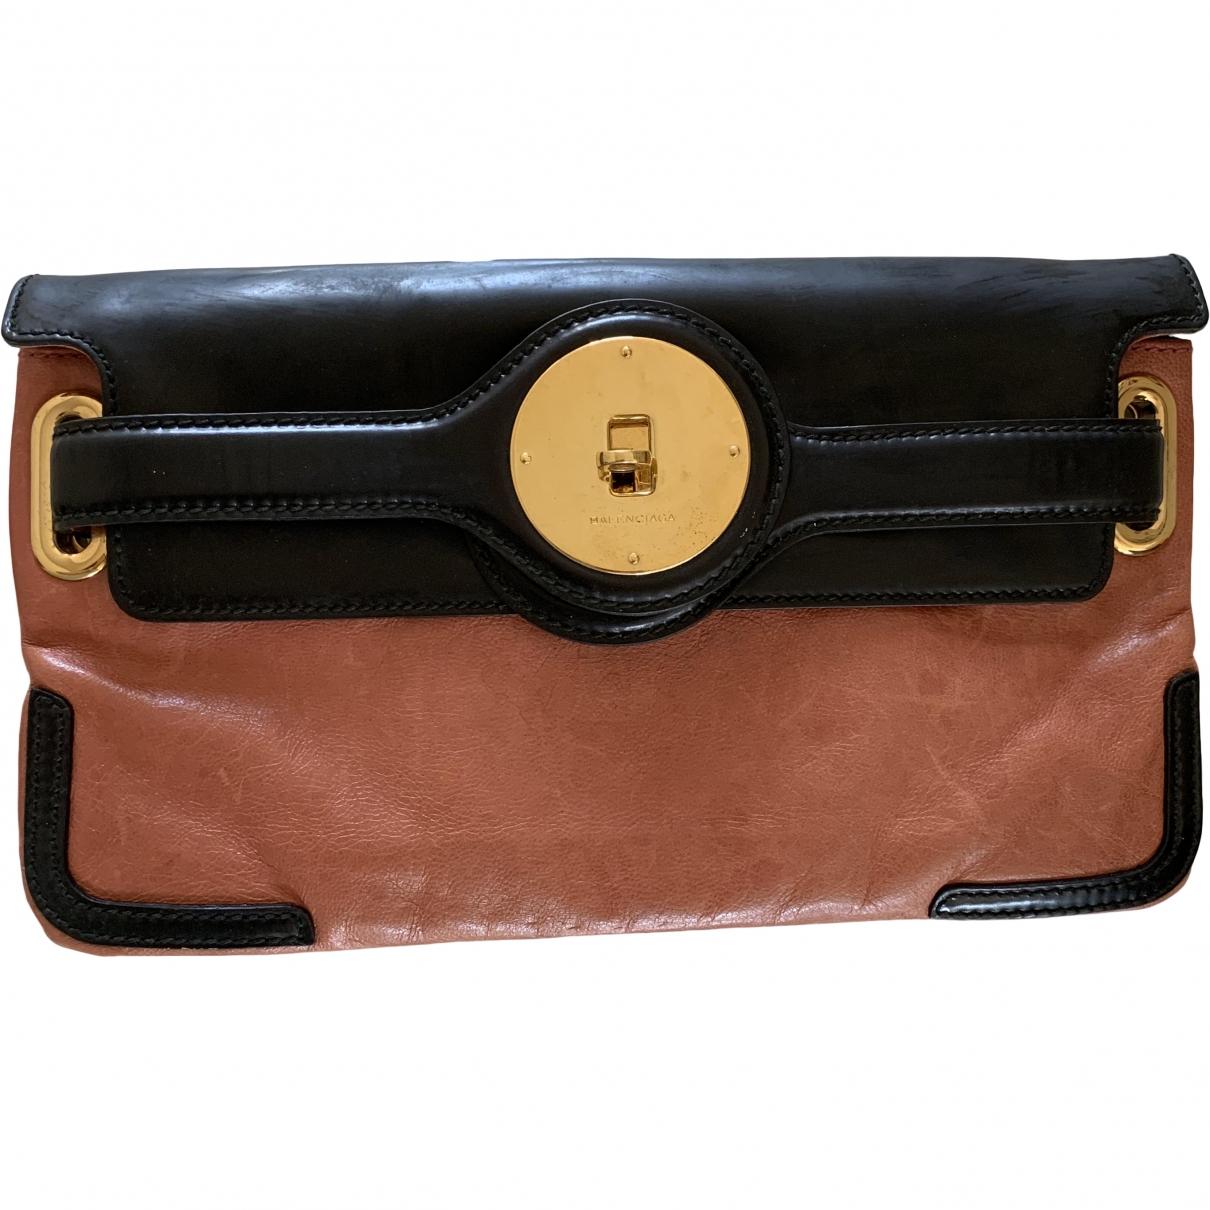 Balenciaga \N Pink Leather Clutch bag for Women \N